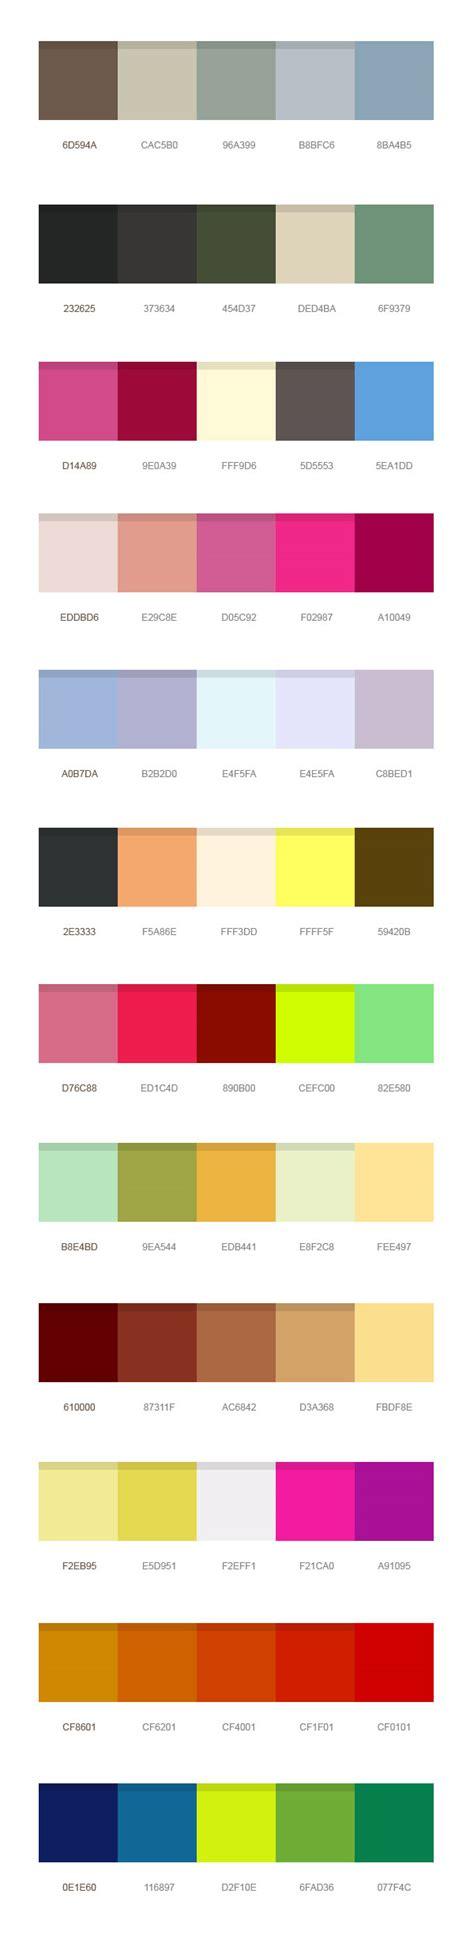 photoshop more color palette madness photoshop graphic design publishing center